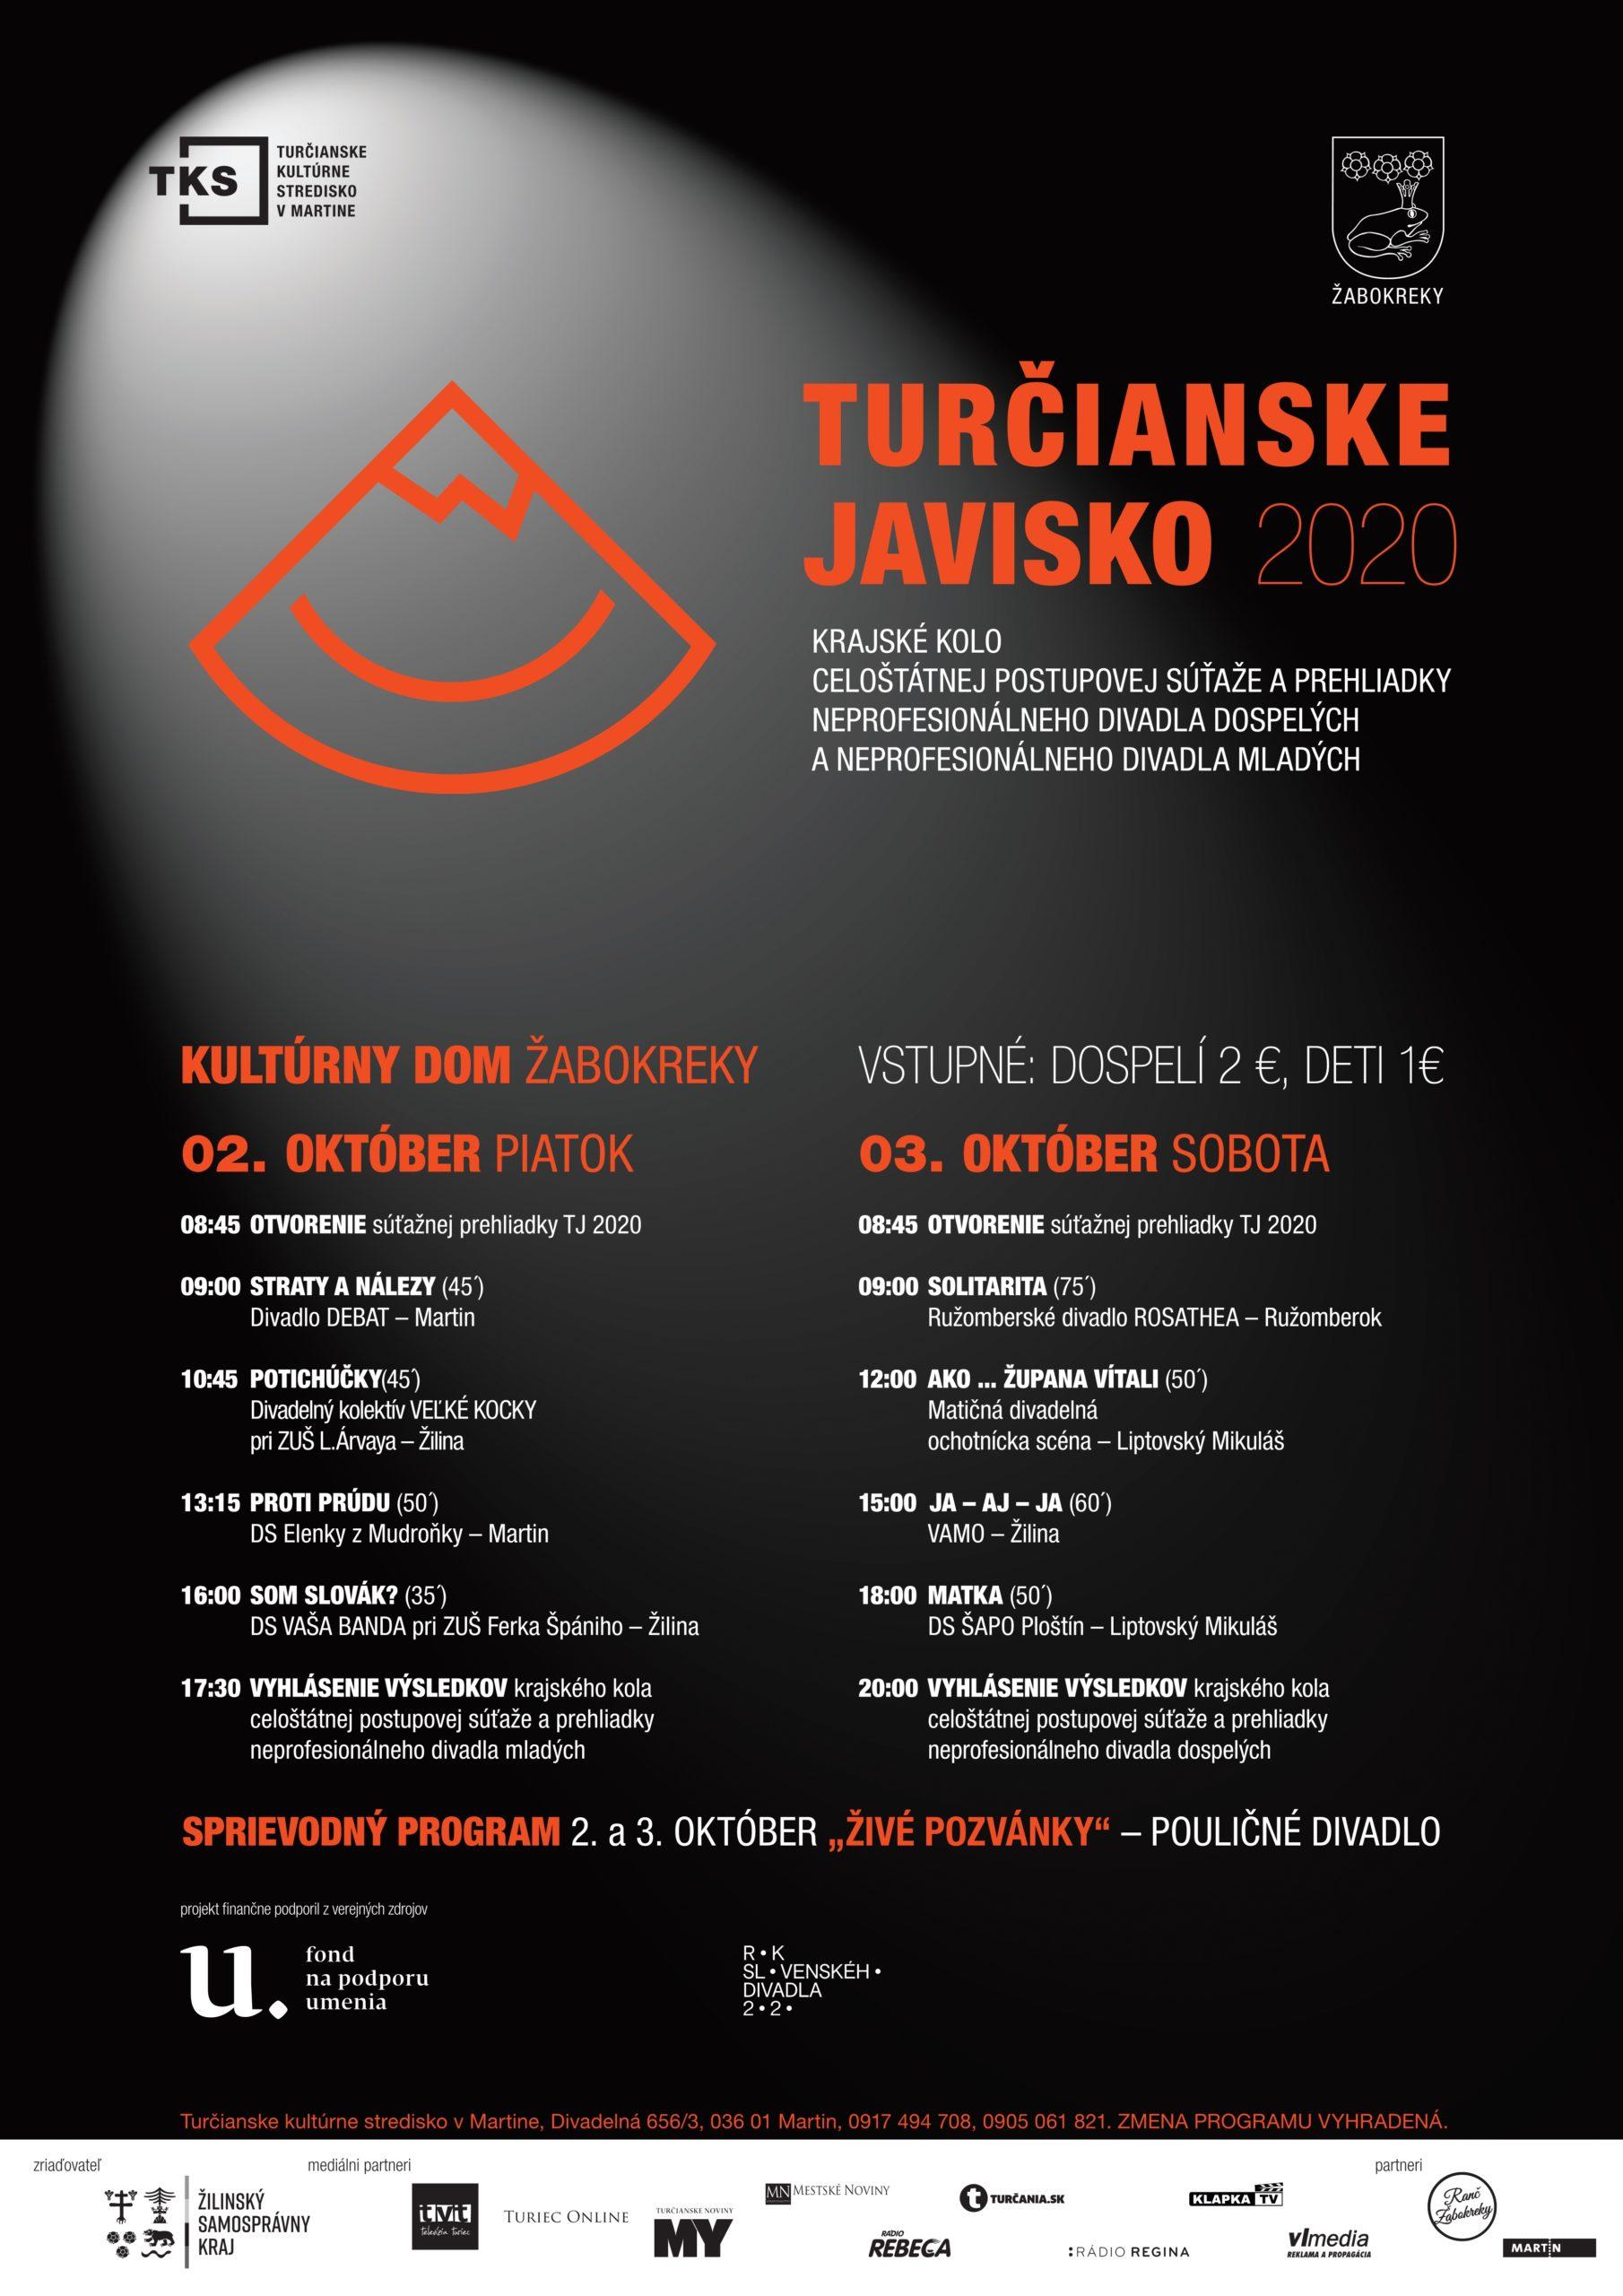 Turčianske javisko 2020